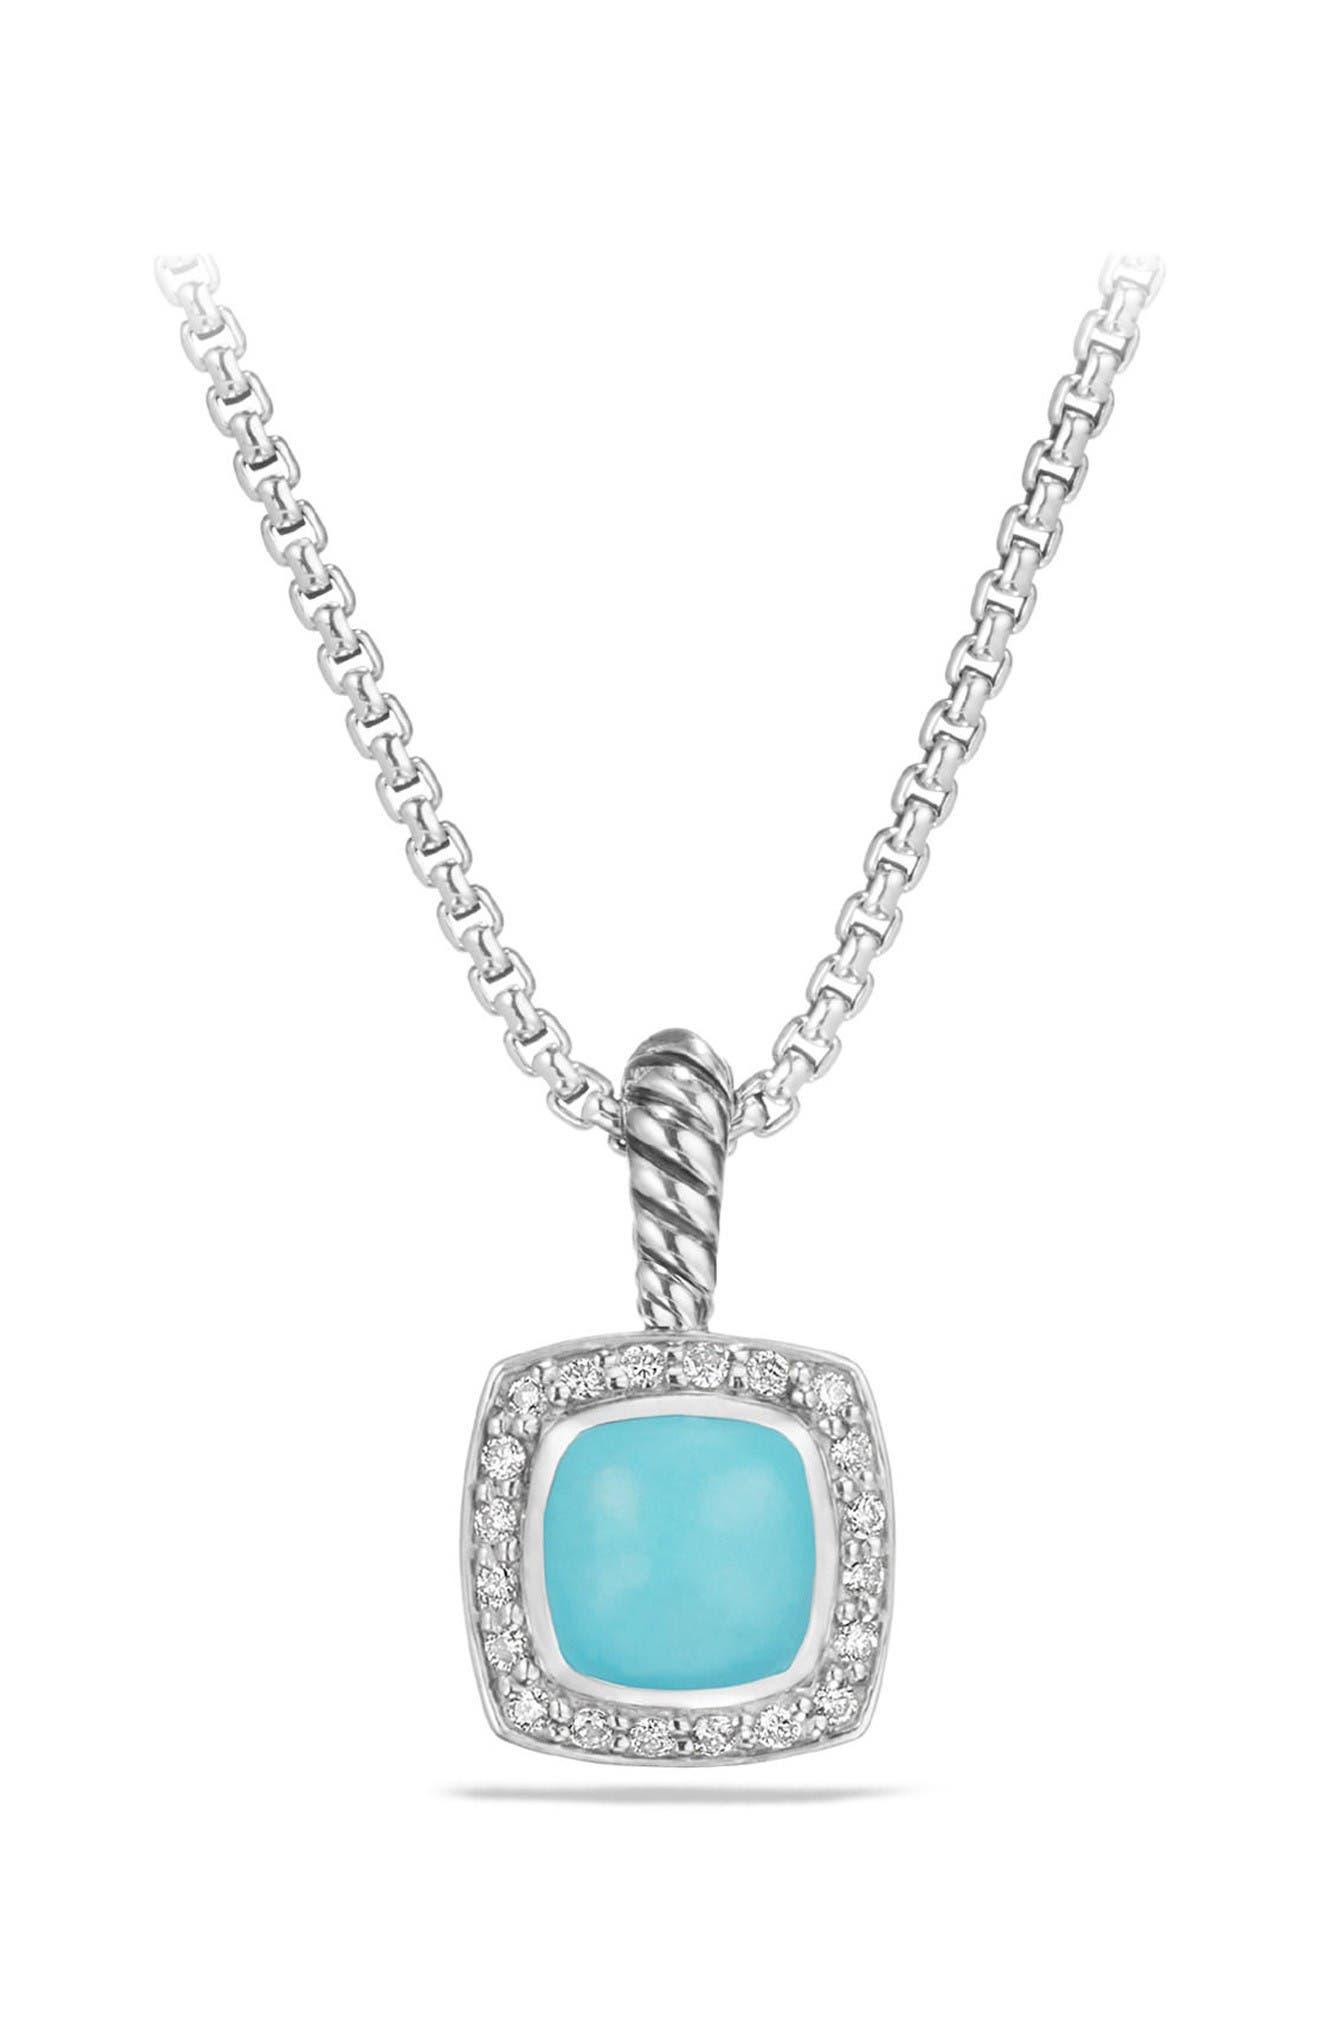 Petite Albion<sup>®</sup> Pendant Necklace with Diamonds,                             Main thumbnail 1, color,                             Silver/ Turquoise